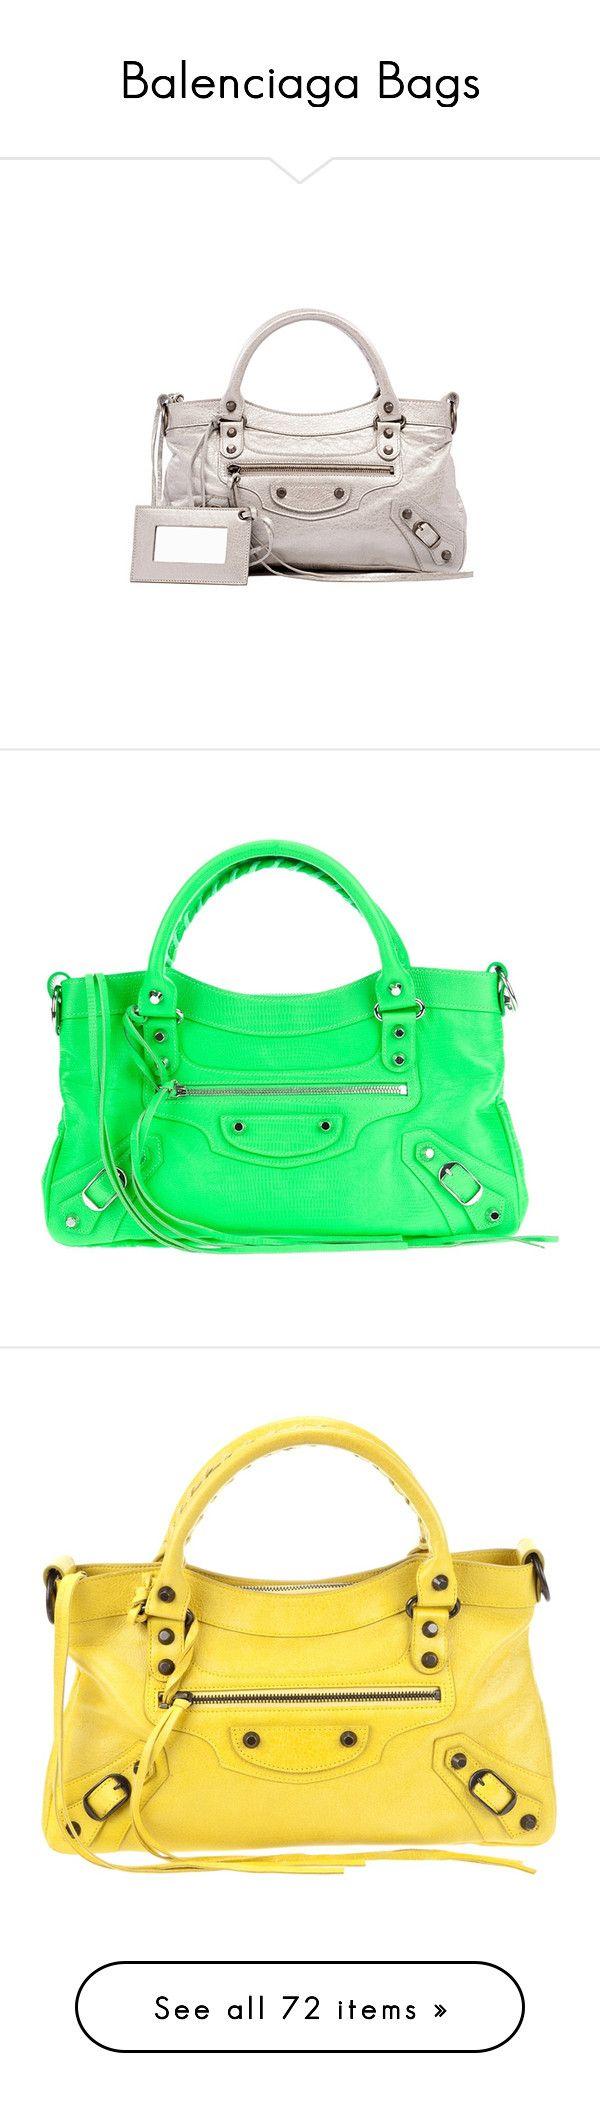 """Balenciaga Bags"" by lucascanutto ❤ liked on Polyvore featuring bags, handbags, balenciaga, totes, balenciaga handbags, balenciaga purse, balenciaga bag, shoulder bags, women and green purse"